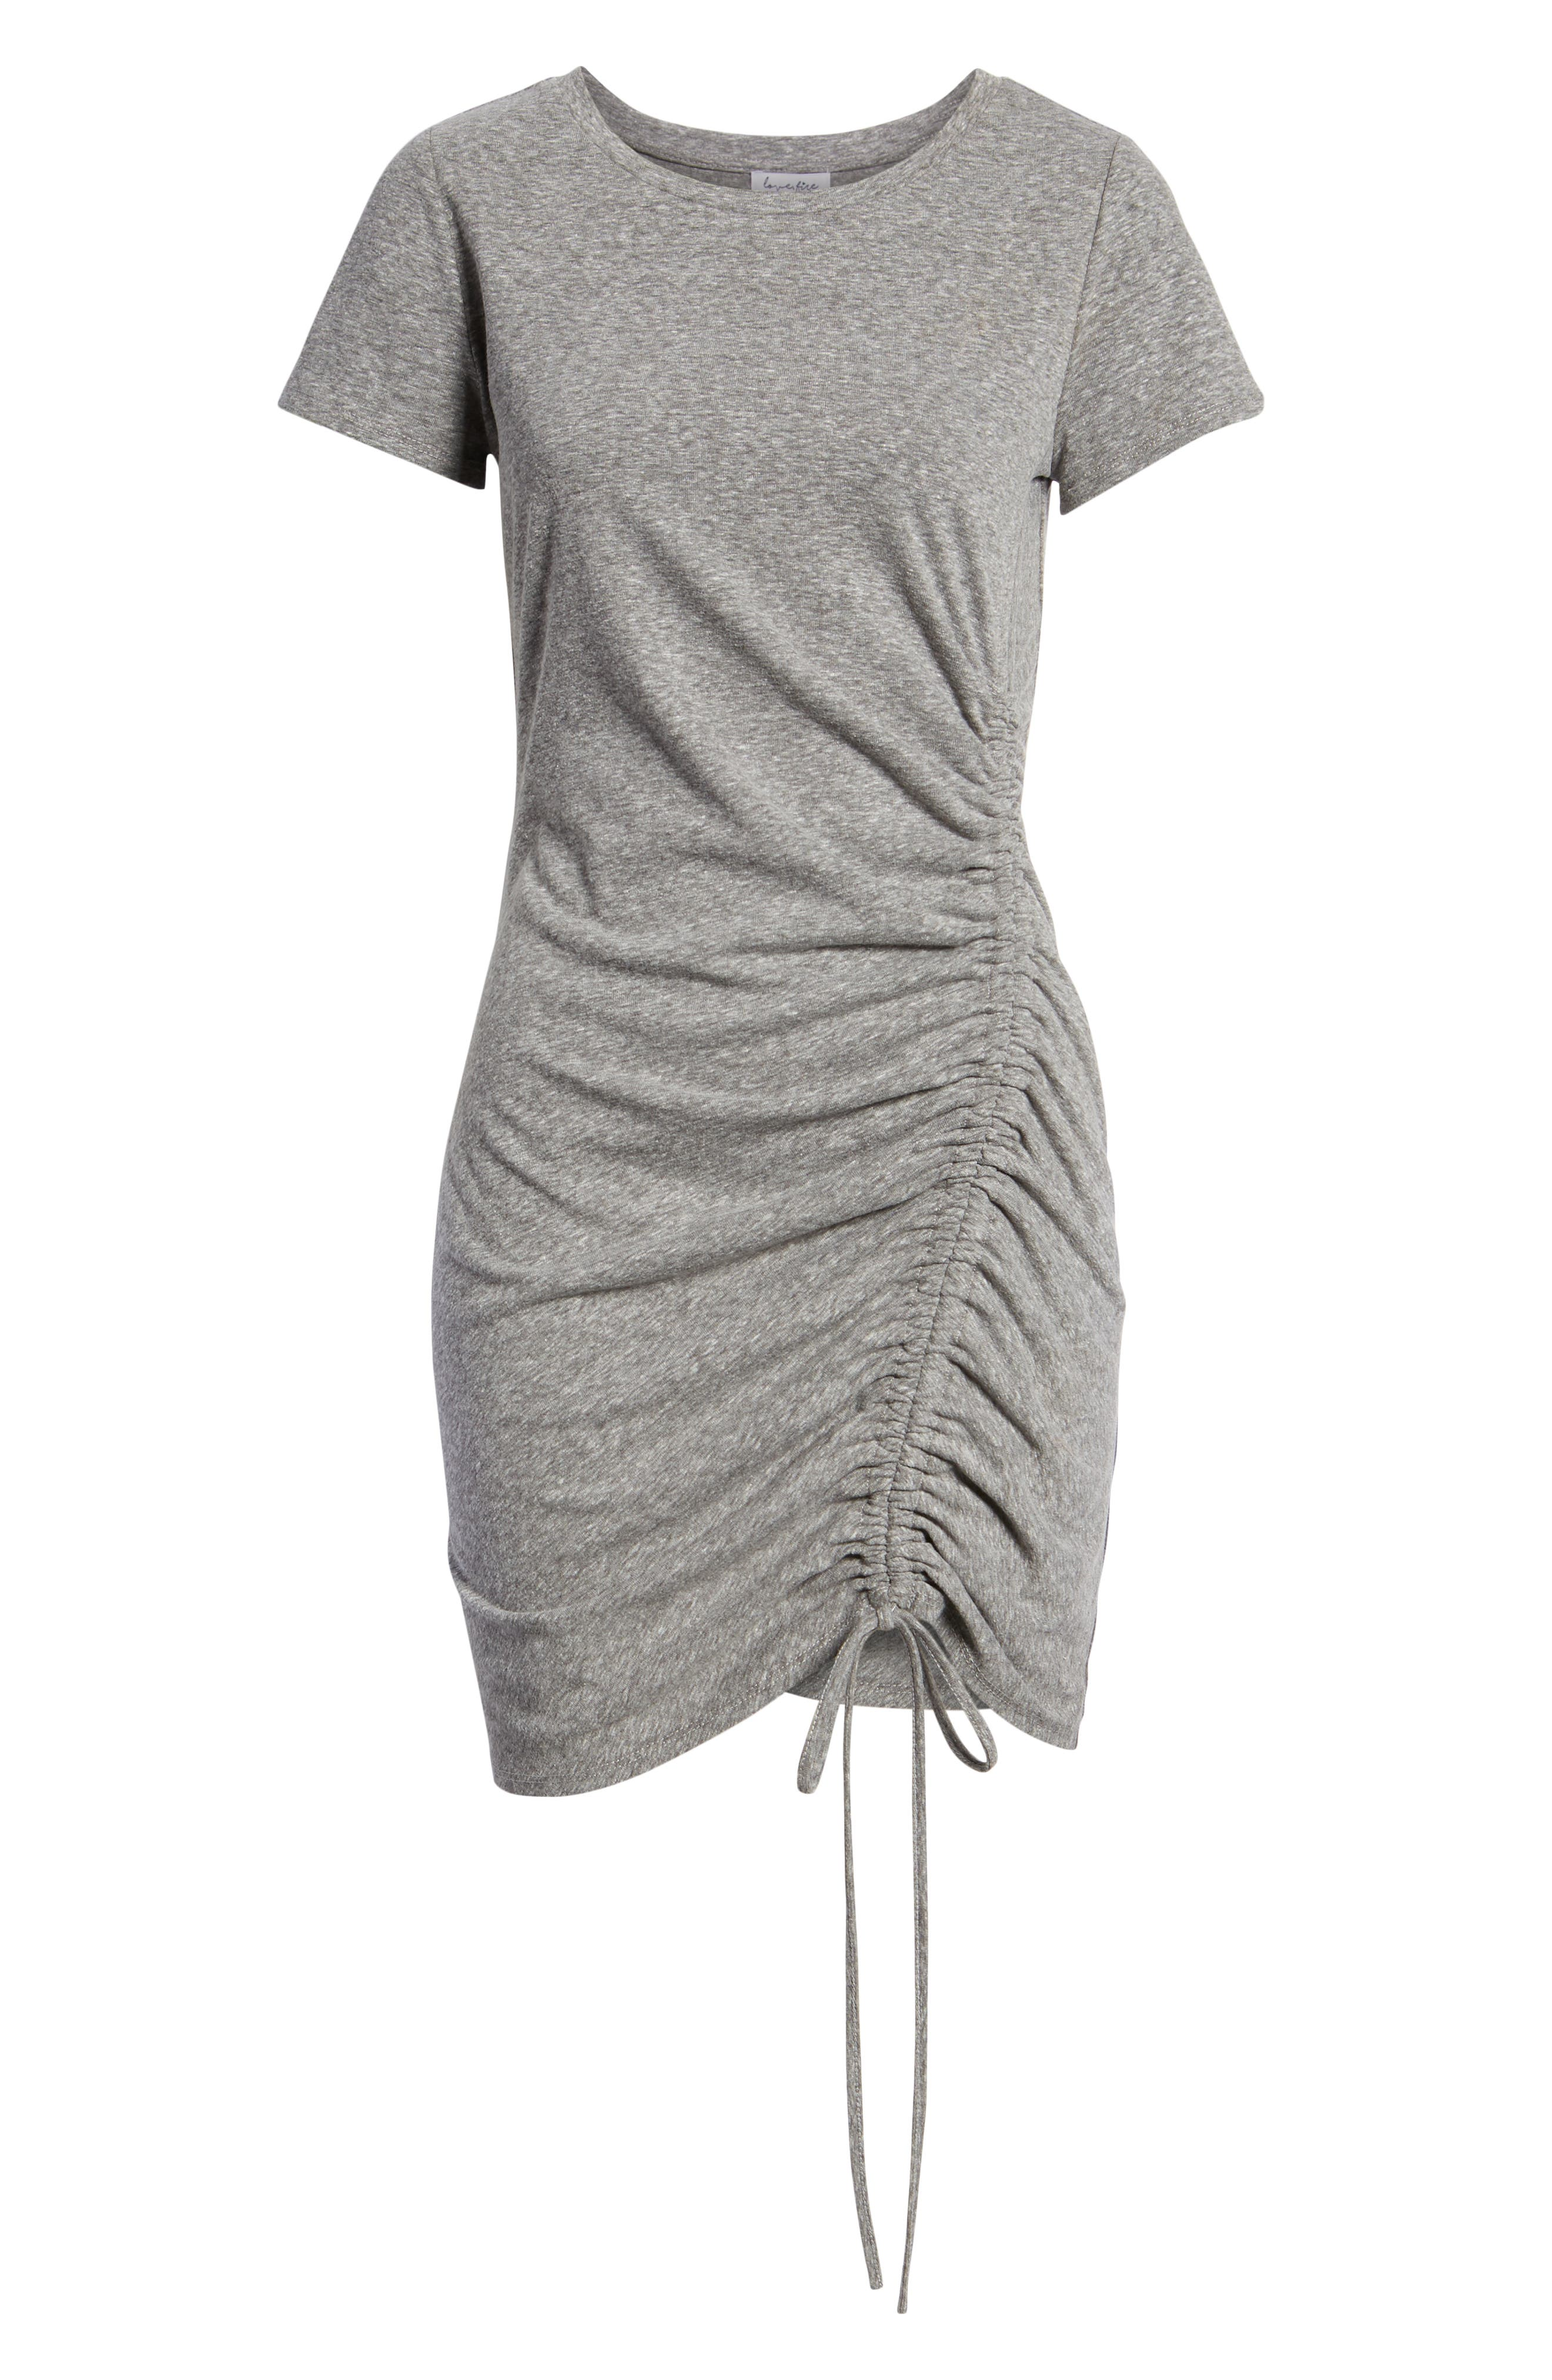 Cinch Side T-Shirt Dress,                             Alternate thumbnail 7, color,                             Heather Grey